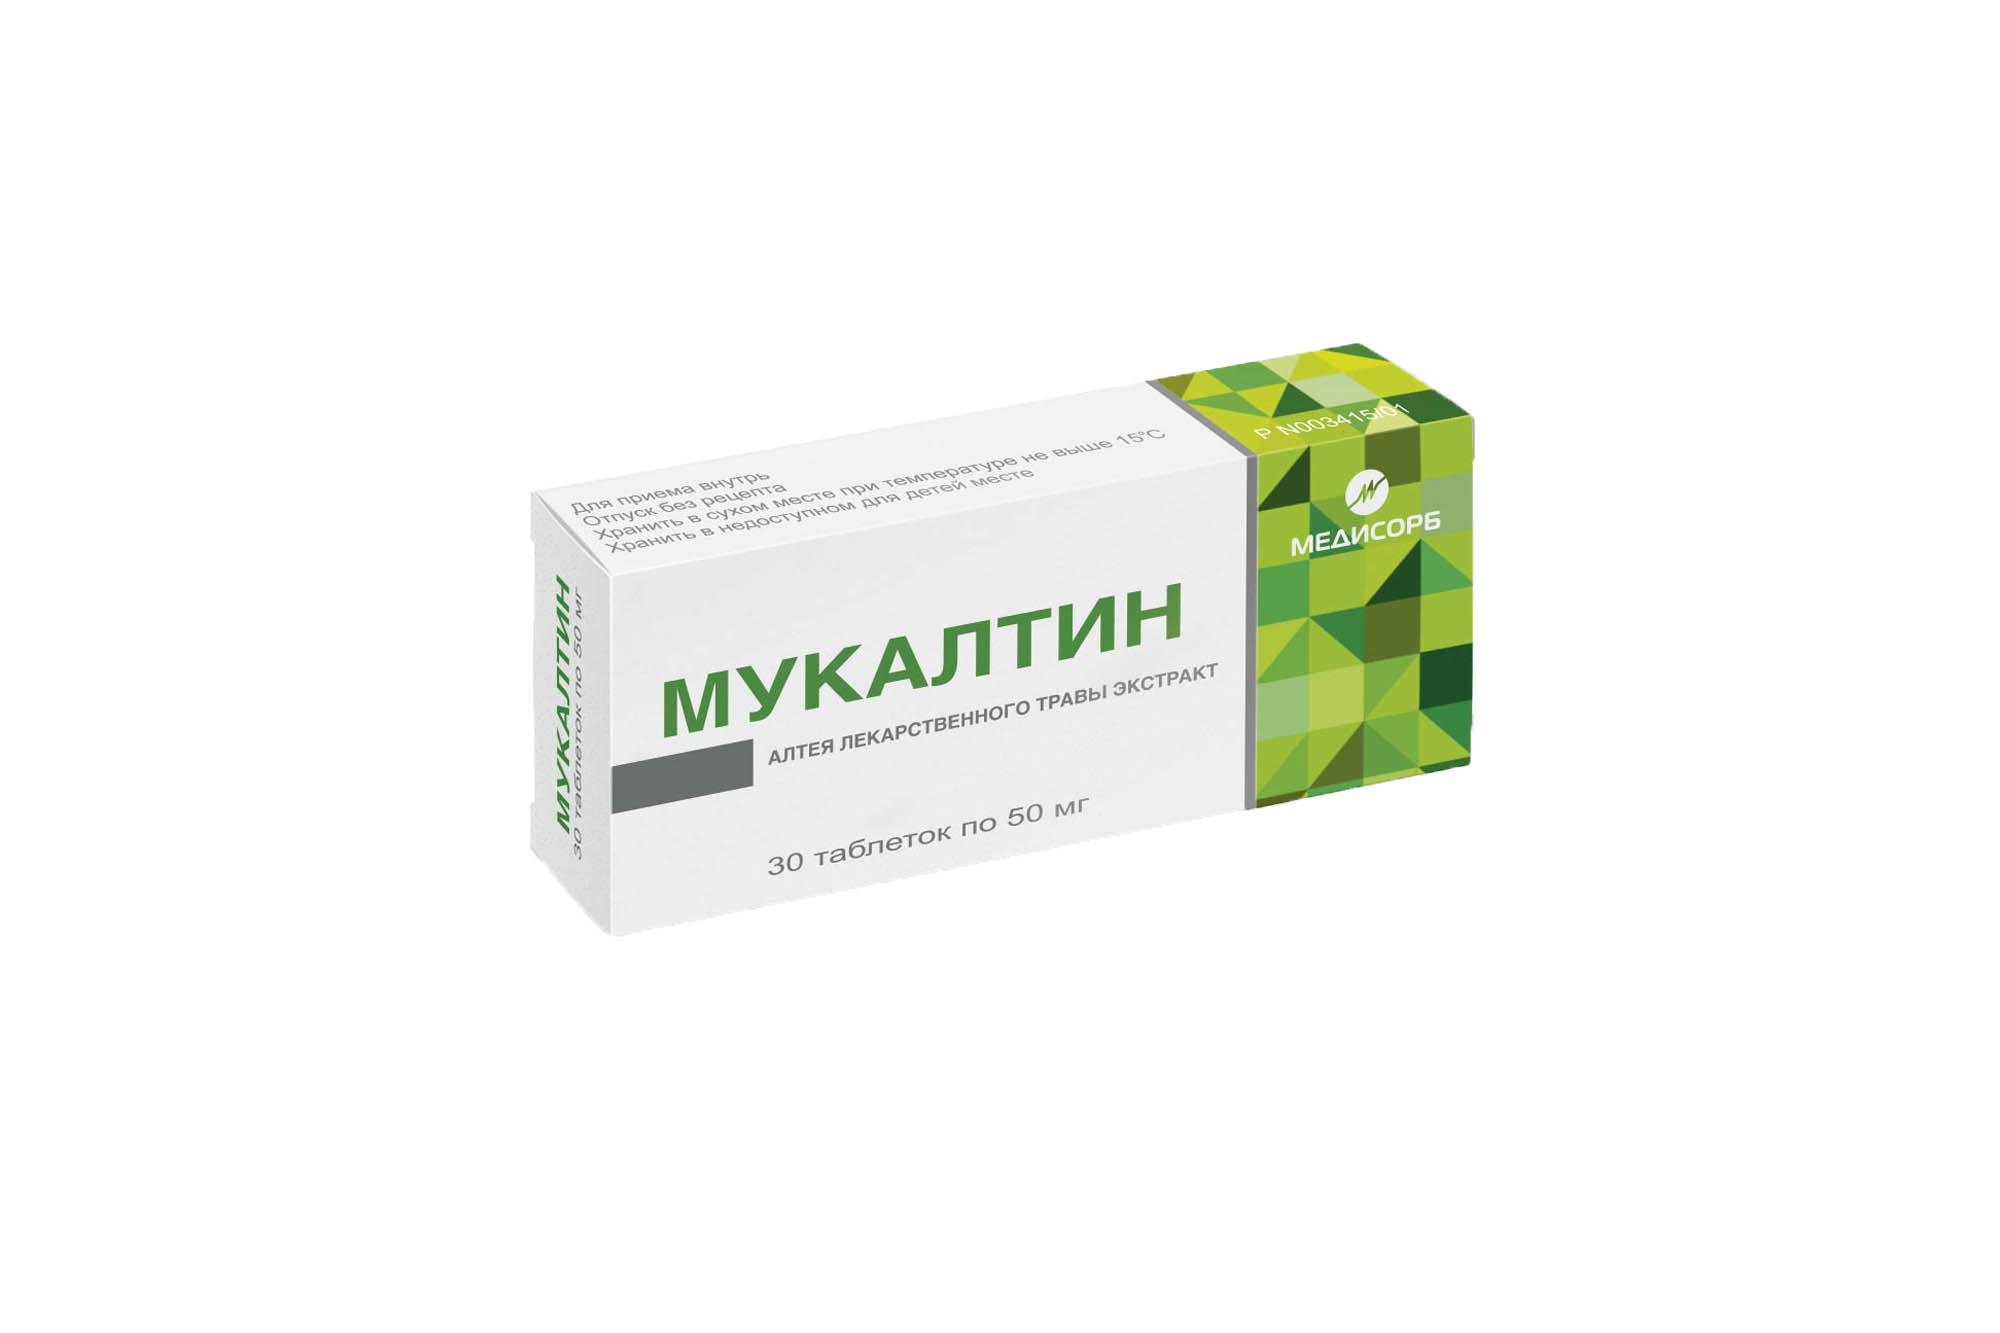 Как помогает Мукалтин при трахеите